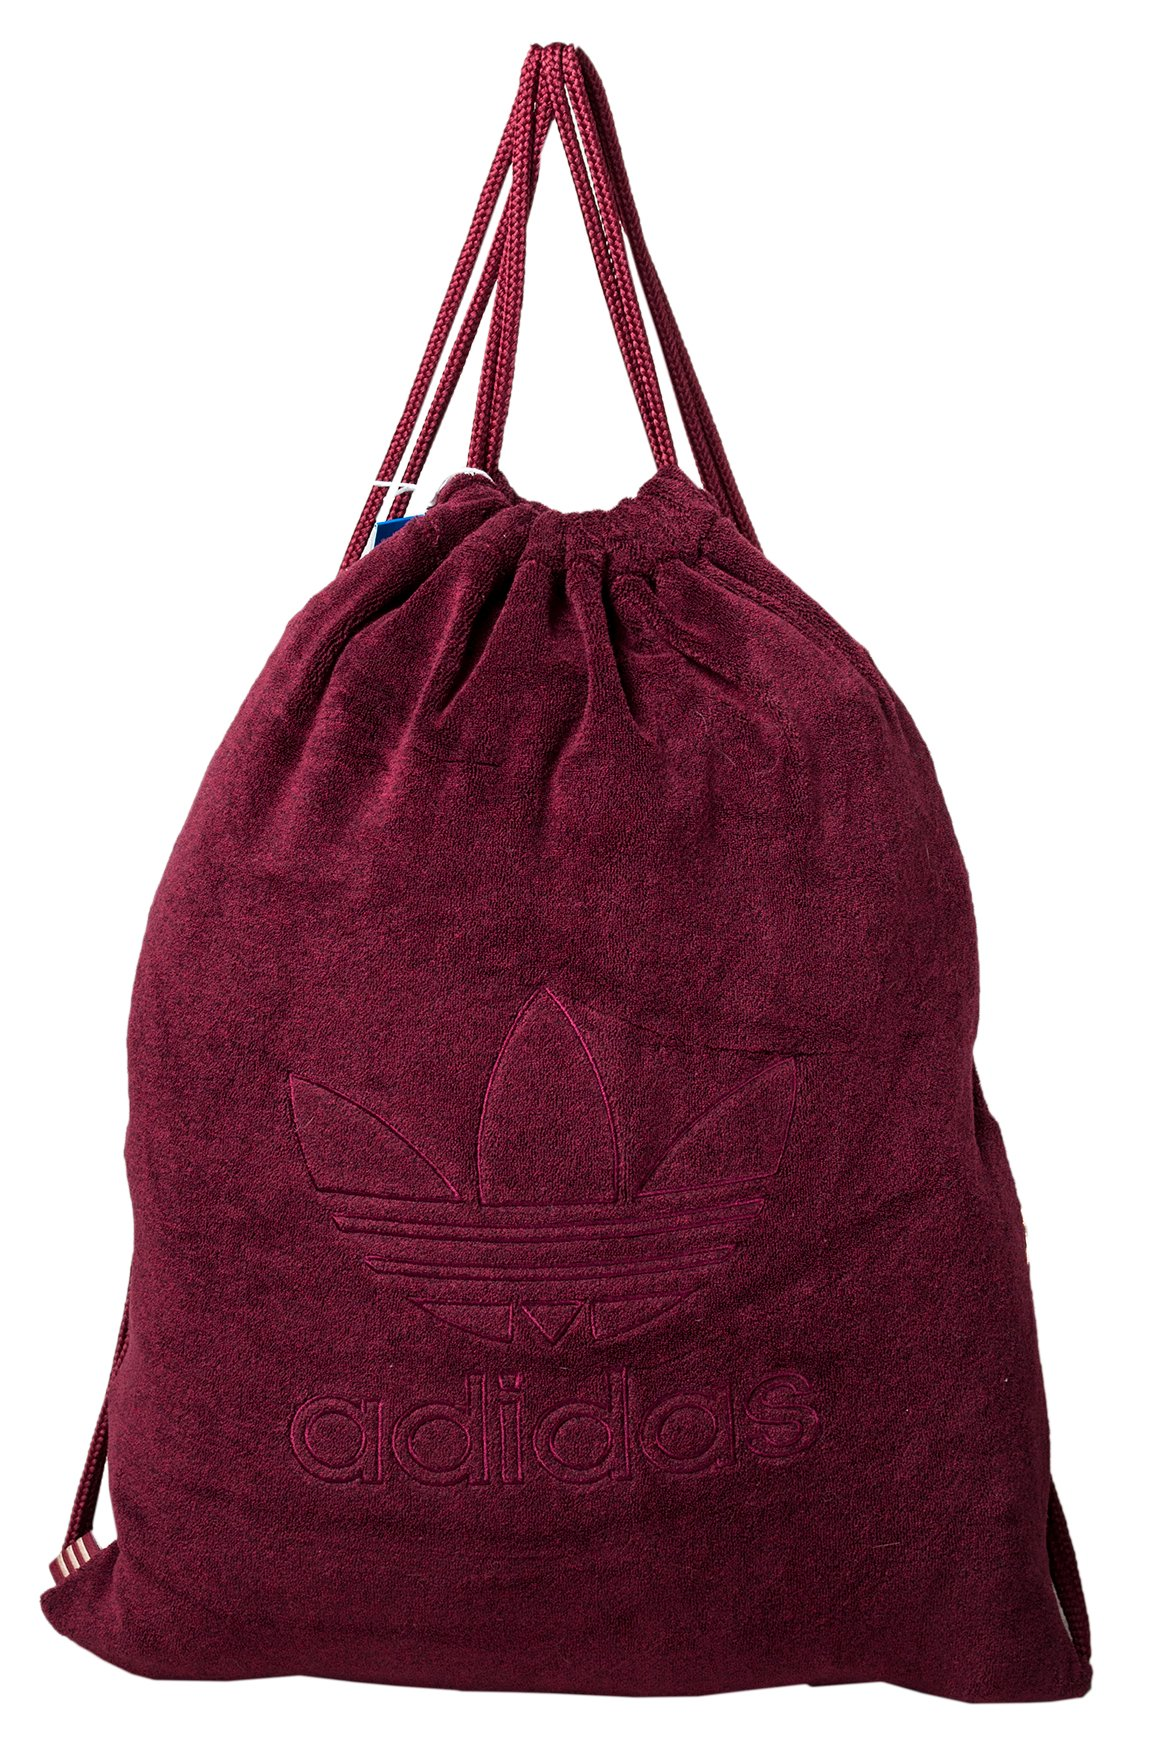 Špeciálne ADIDAS taška taška cez rameno batoh s kiesz na Zam